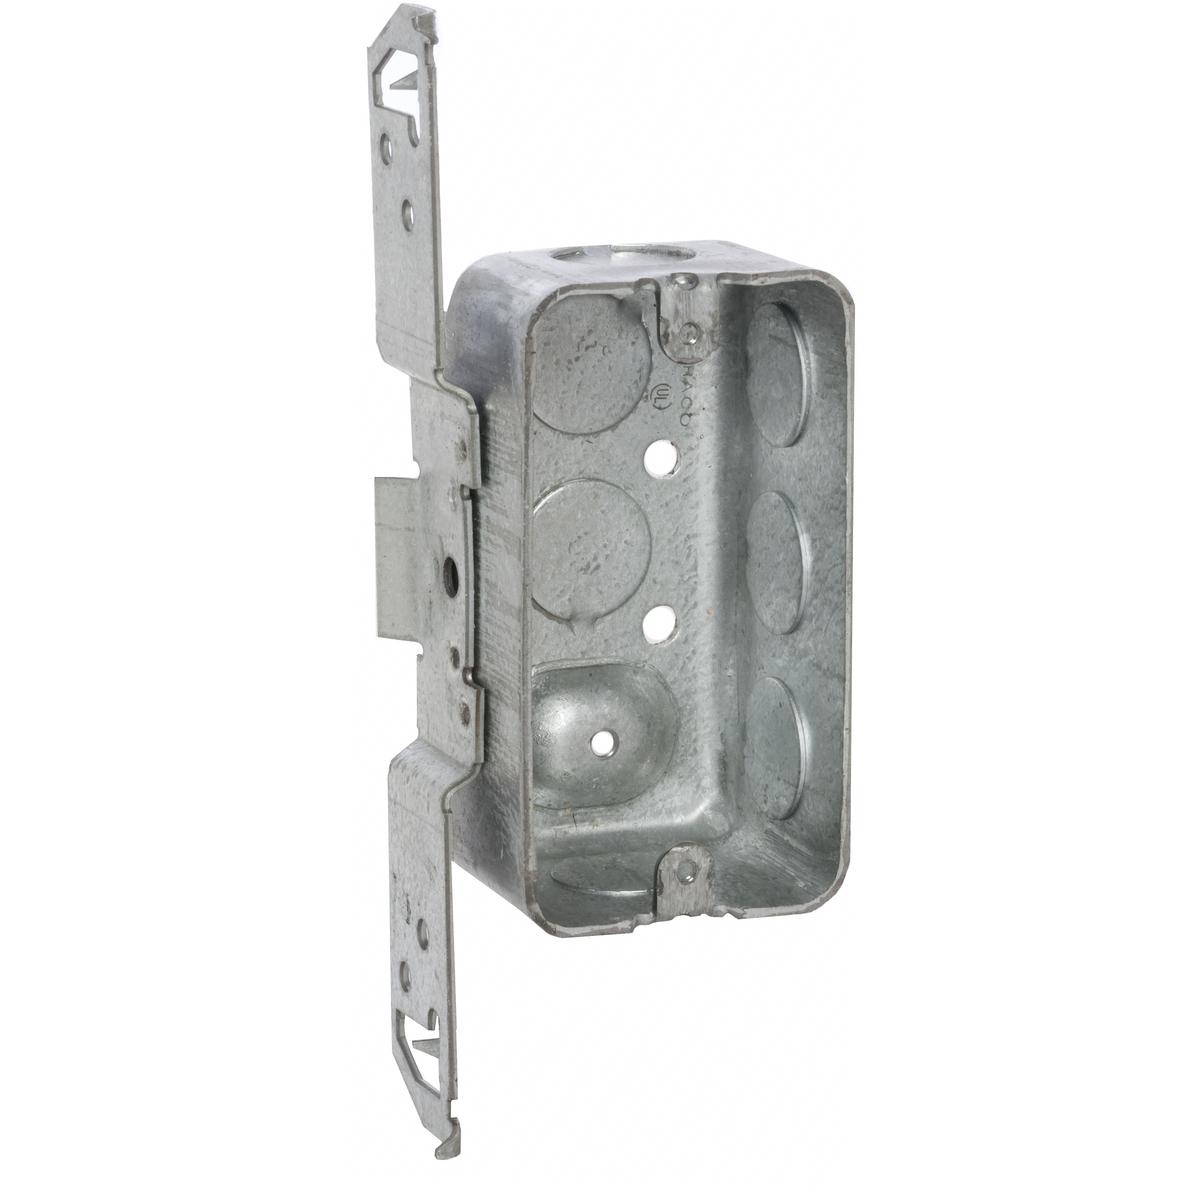 Hubbell-Raco 662 Handy Box